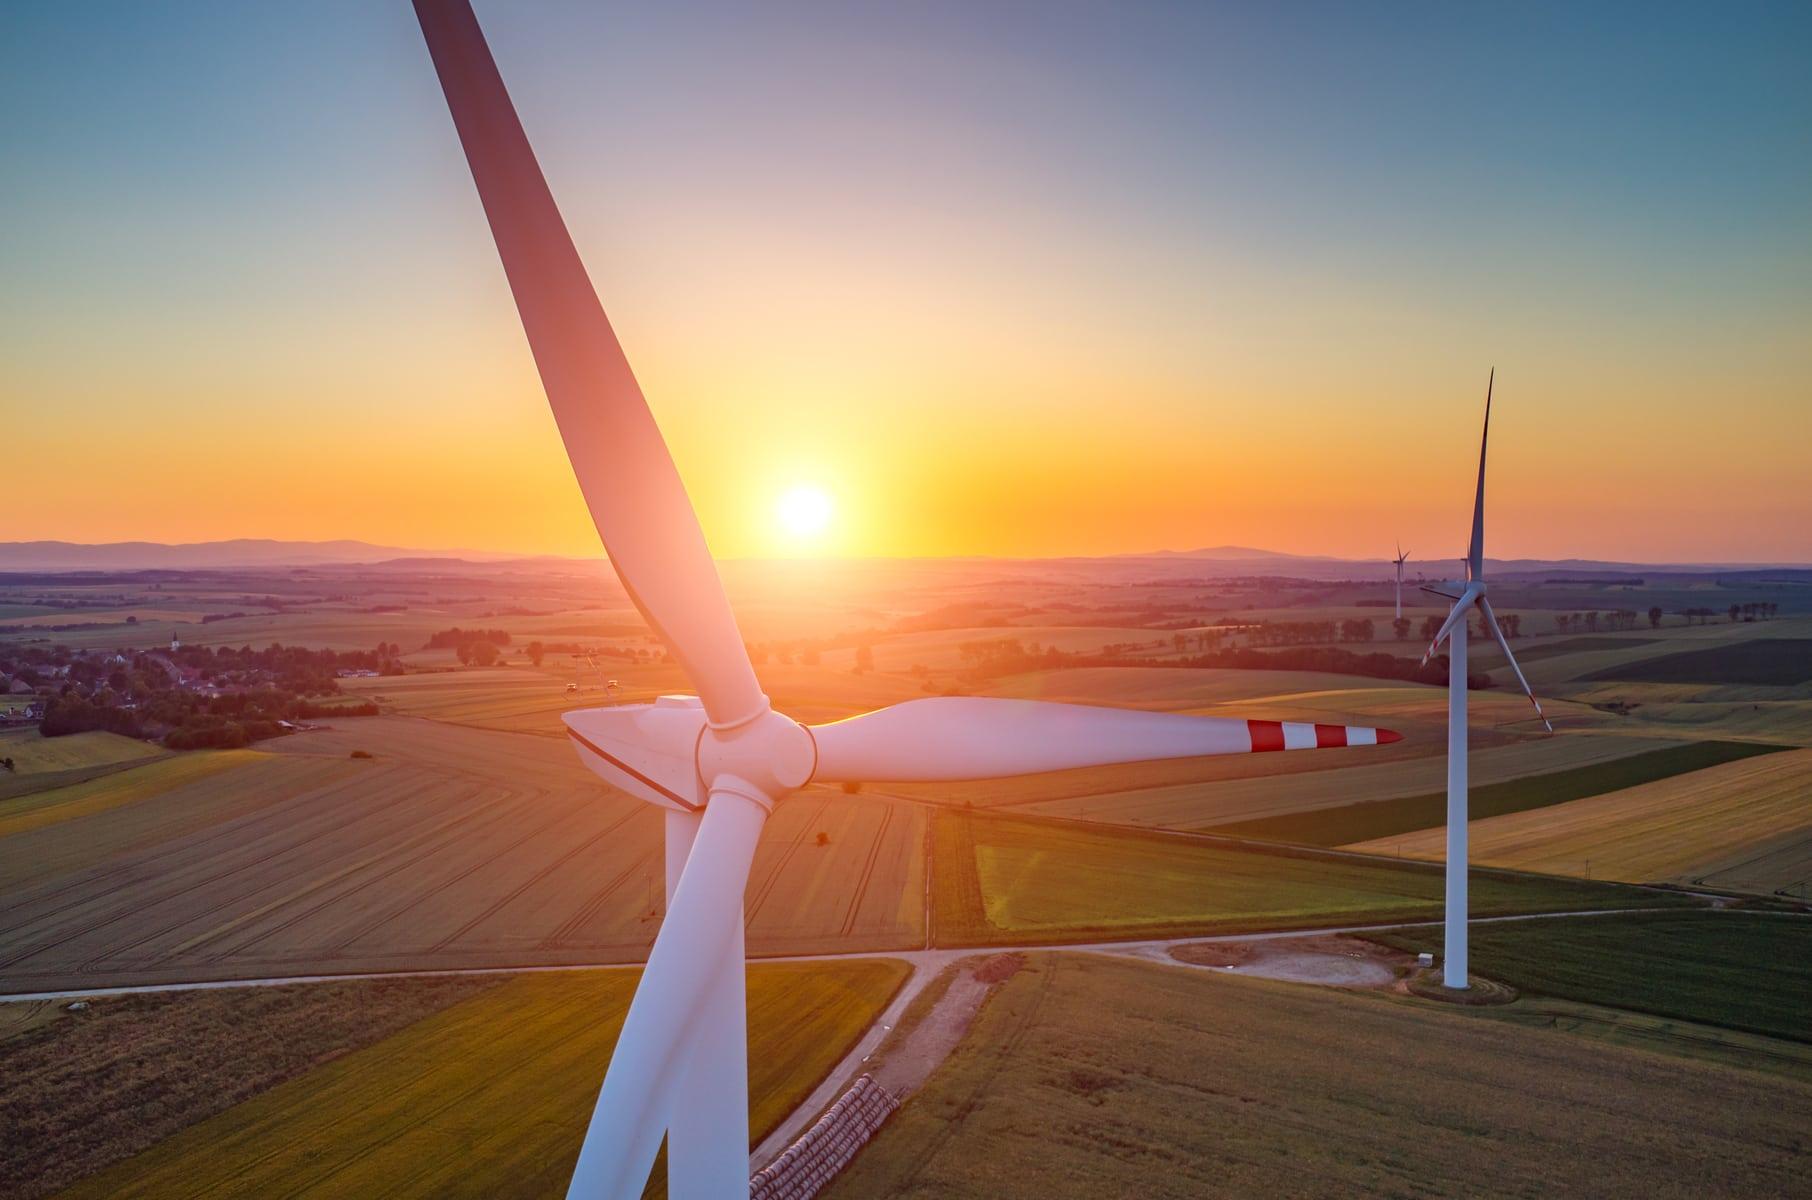 Onderweg naar 55% minder uitstoot in 2030: Europese Commissie presenteert 'Fit for 55' – pakket